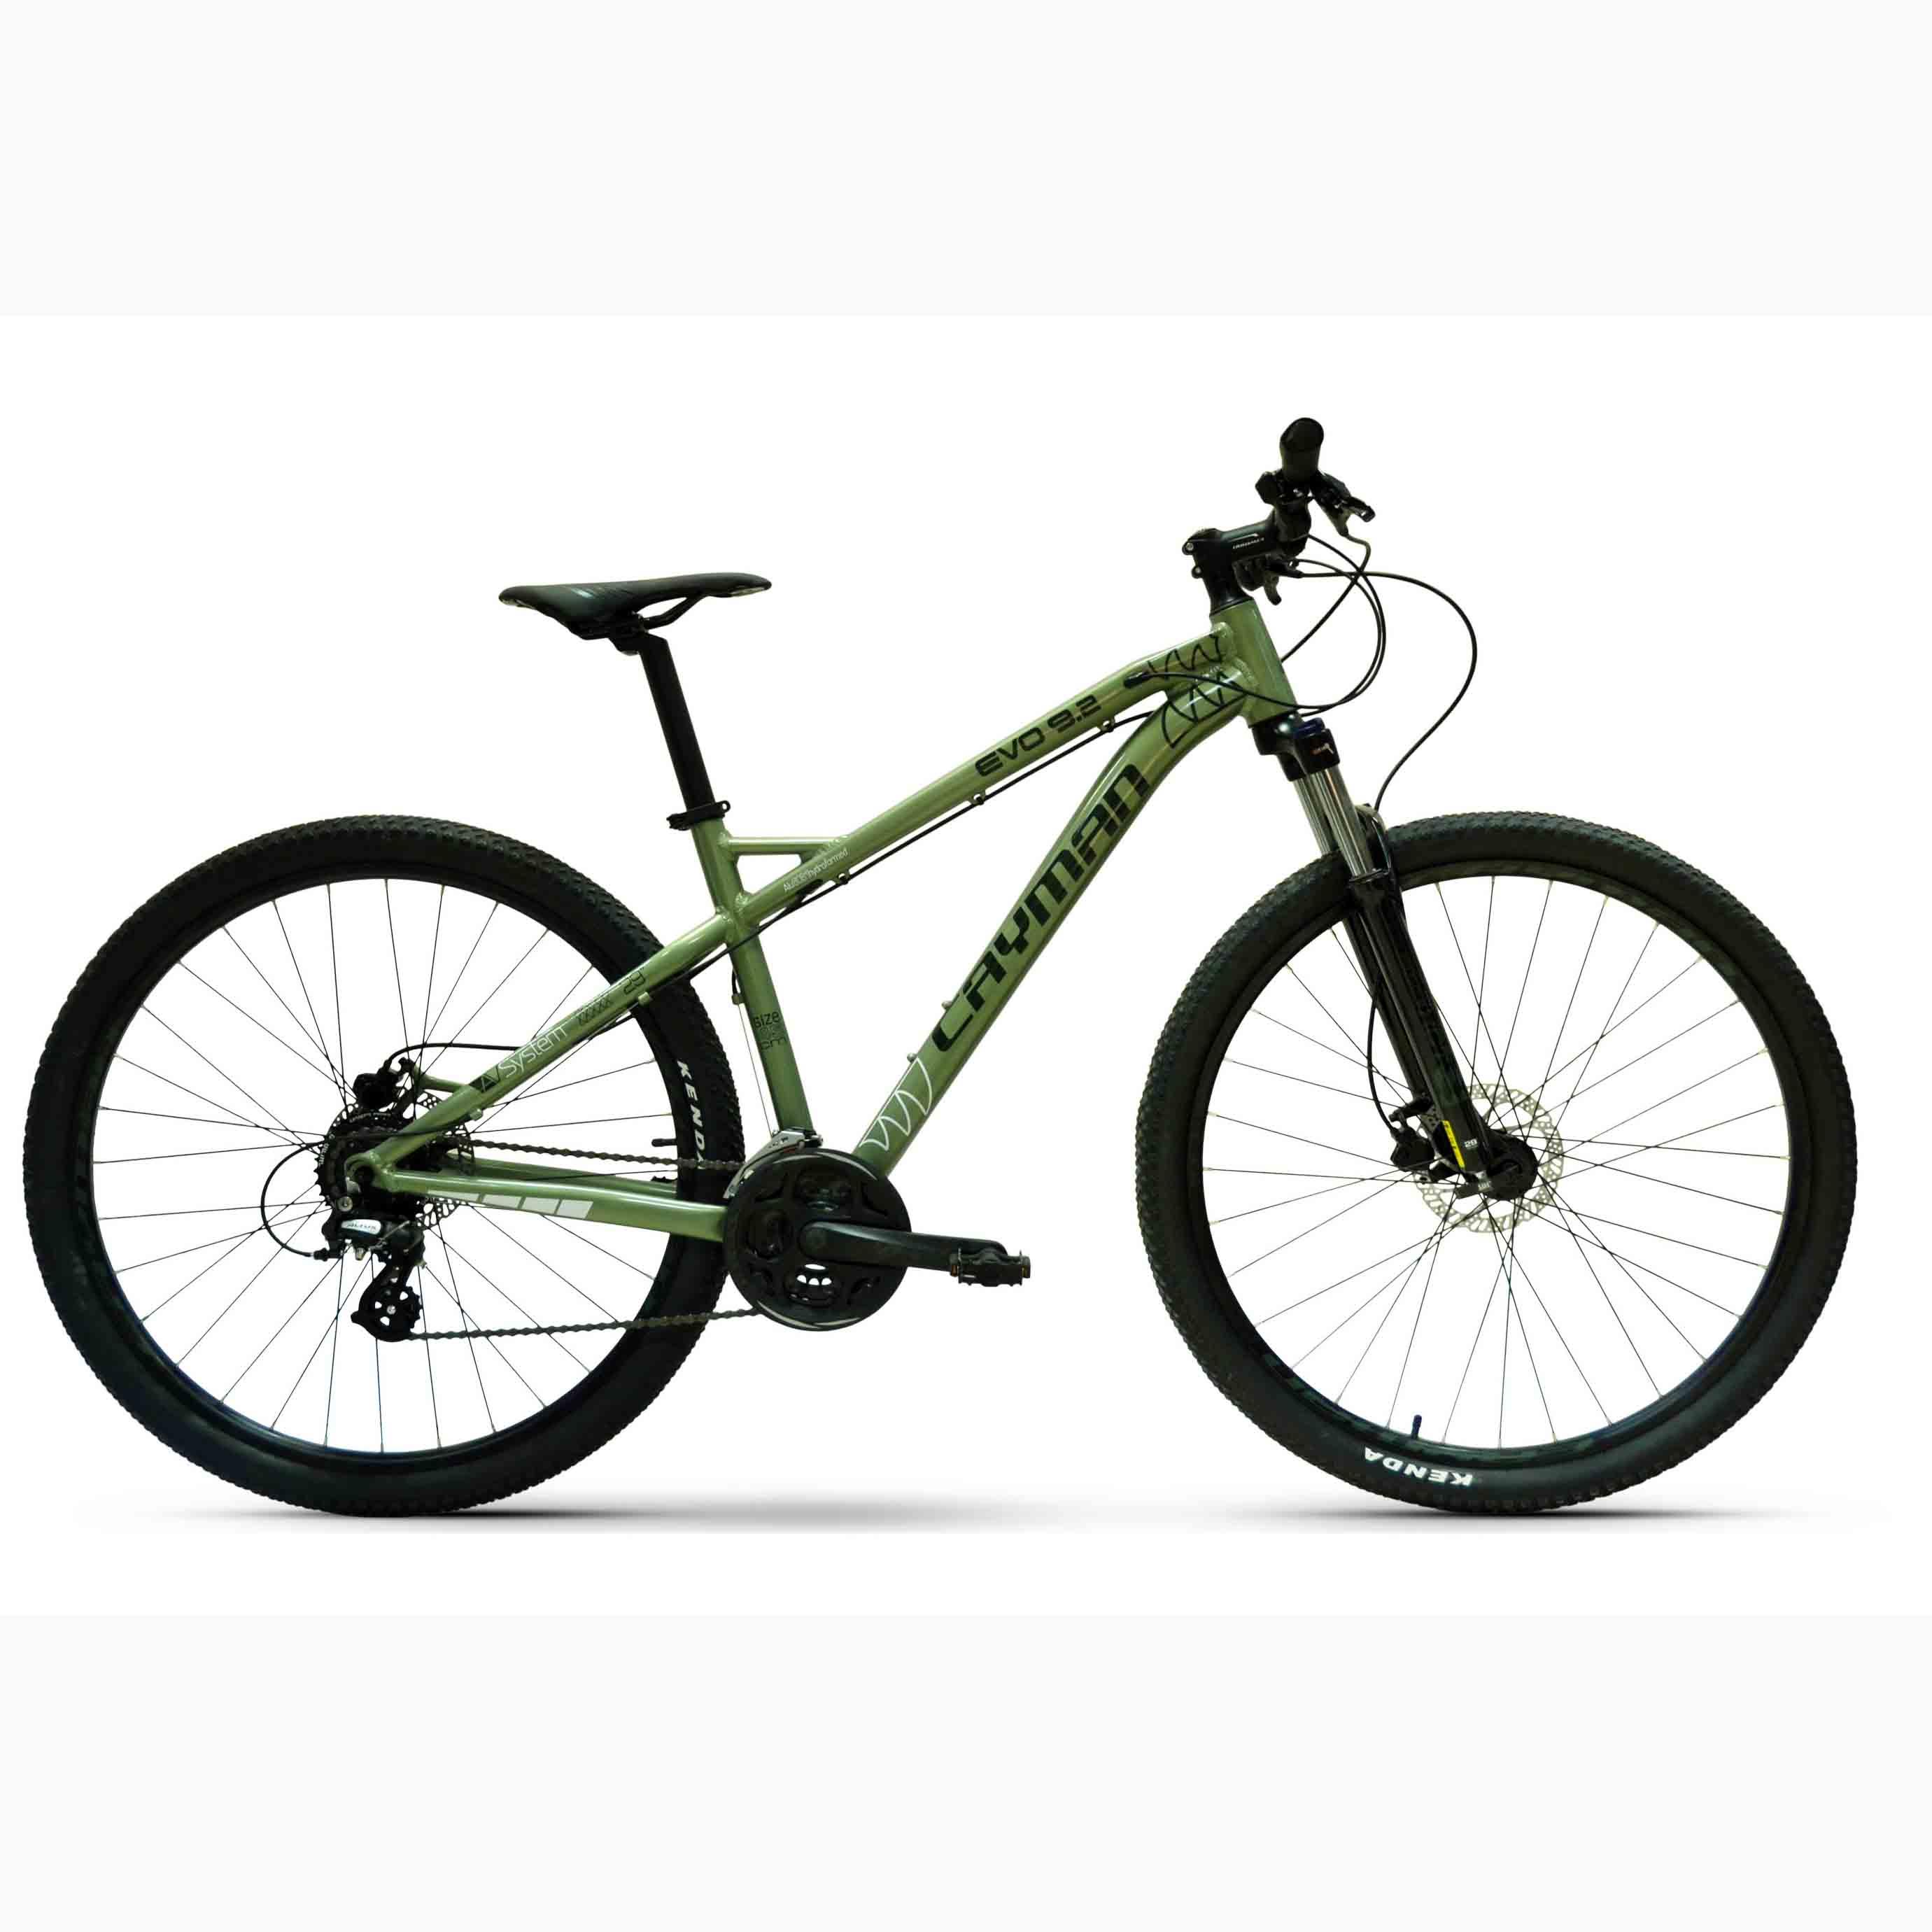 Фото Велосипед Cayman Evo 9.2 29″, рама 50см, 2018